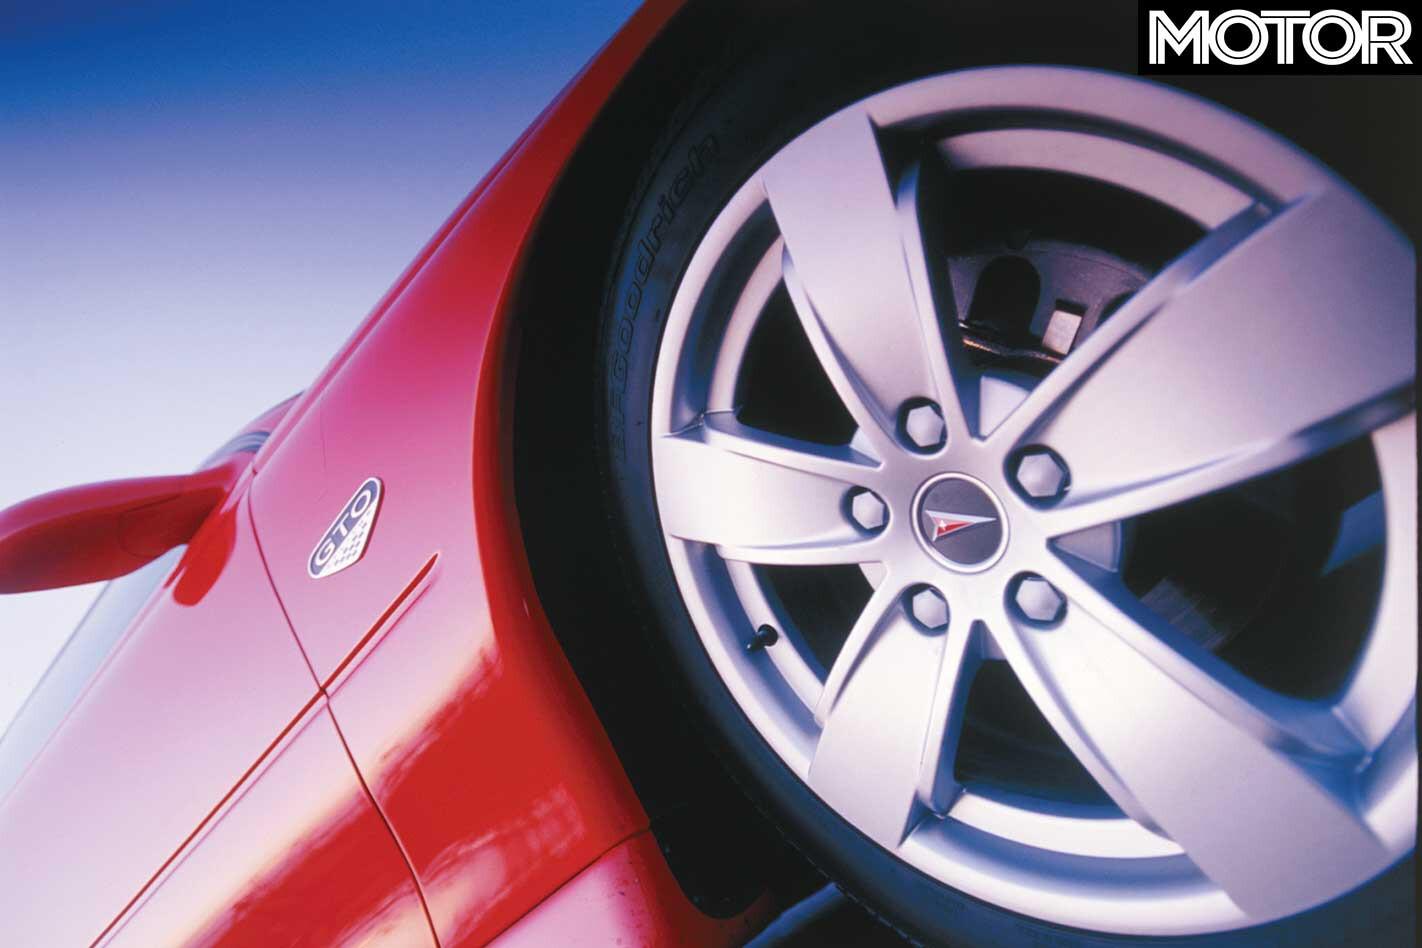 2004 Pontiac GTO Wheels Jpg